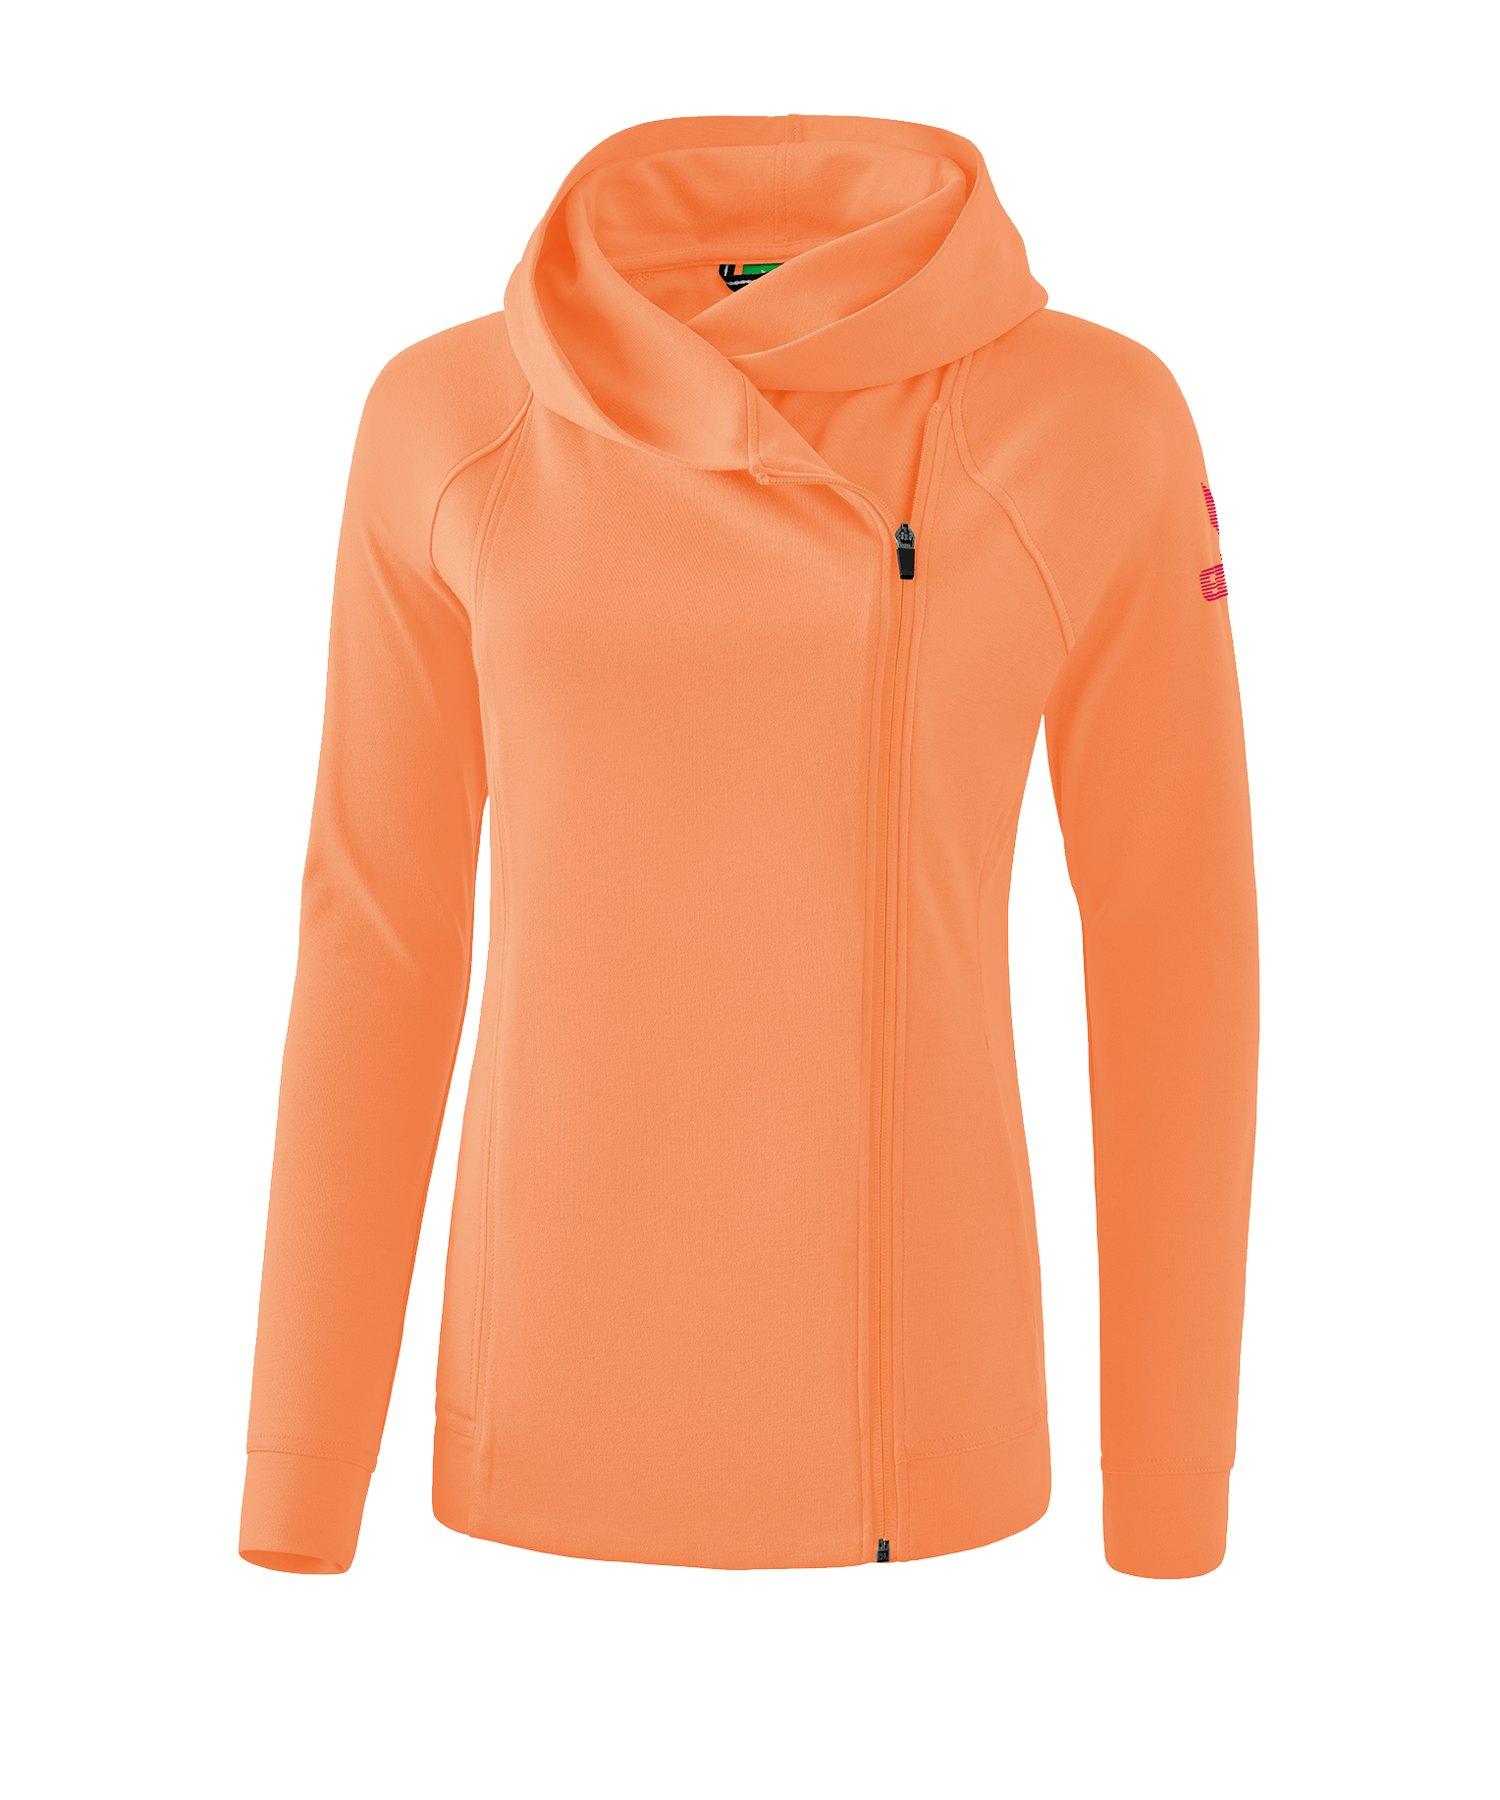 Erima Essential Kapuzensweatjacke Kids Orange - Orange